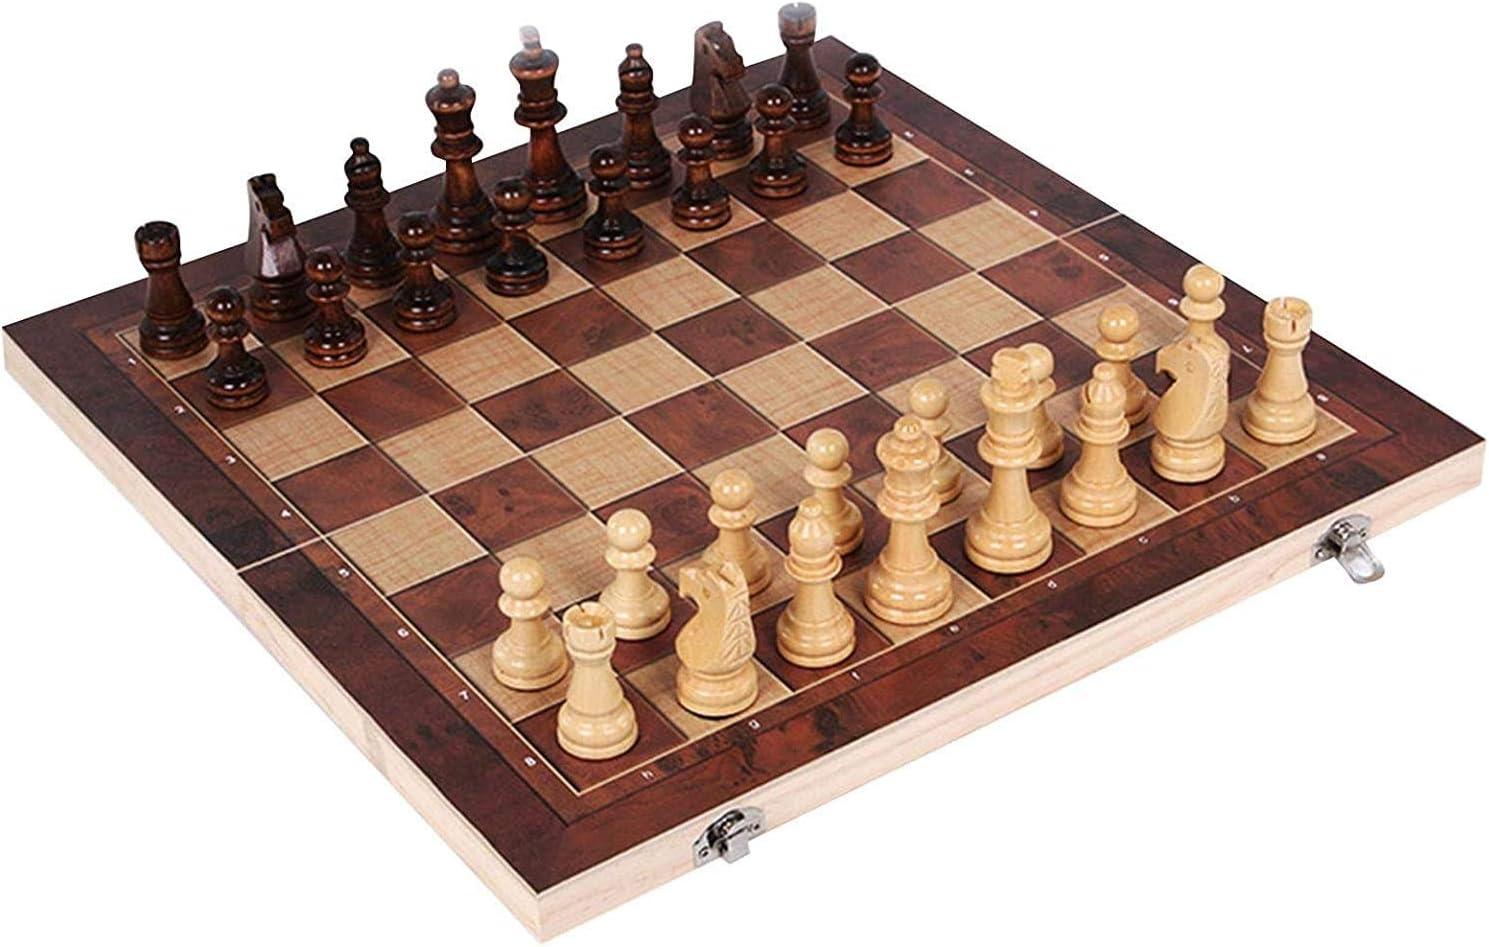 GXBCS San Francisco Award Mall Chess Set with Folding Board Storage Family P Portable for